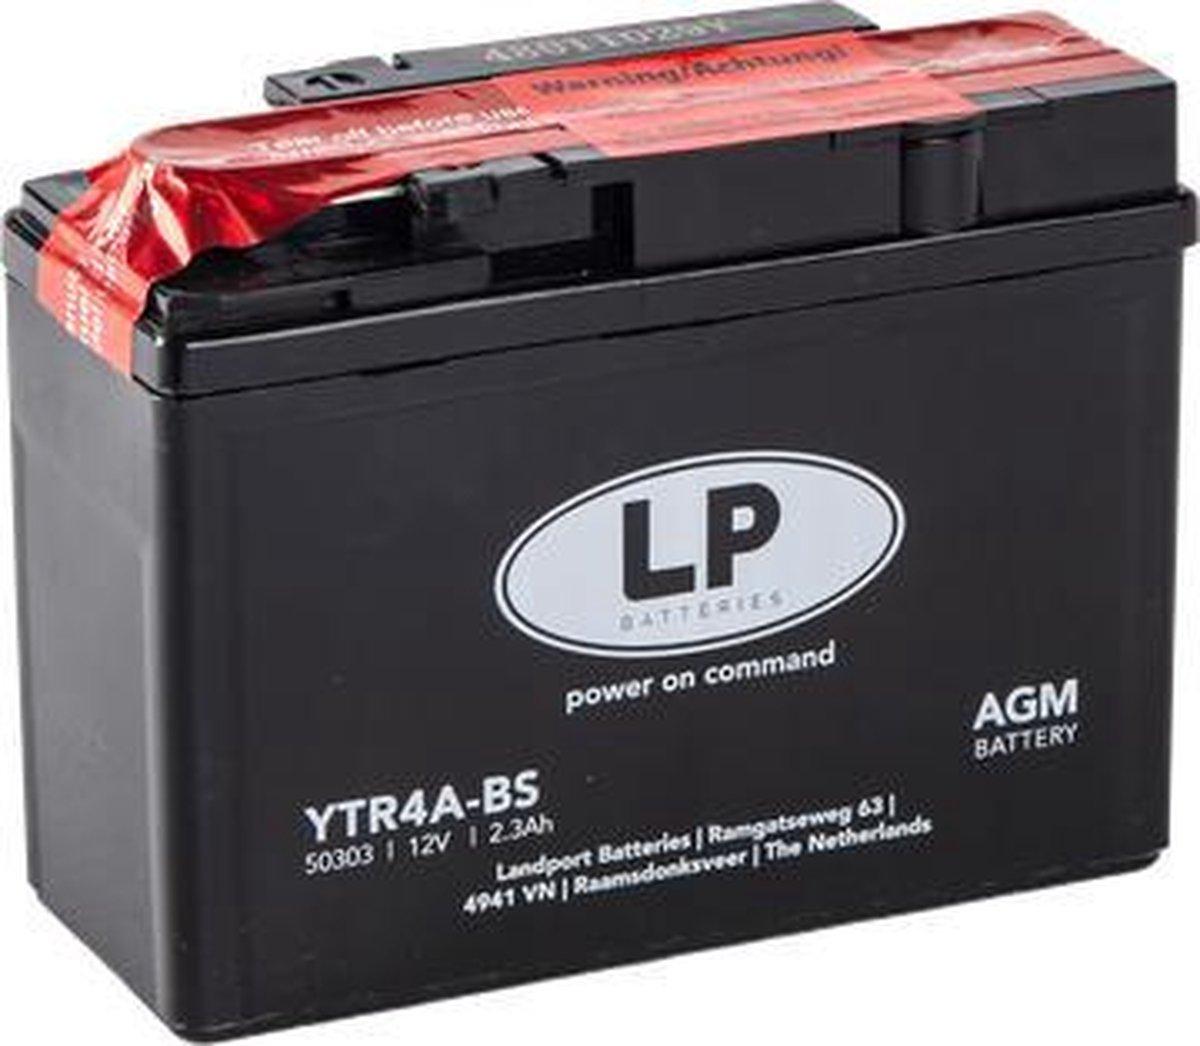 Landport AGM Motor/Scooter accu YTR4A-BS   12V / 2,3AH / 40CCA